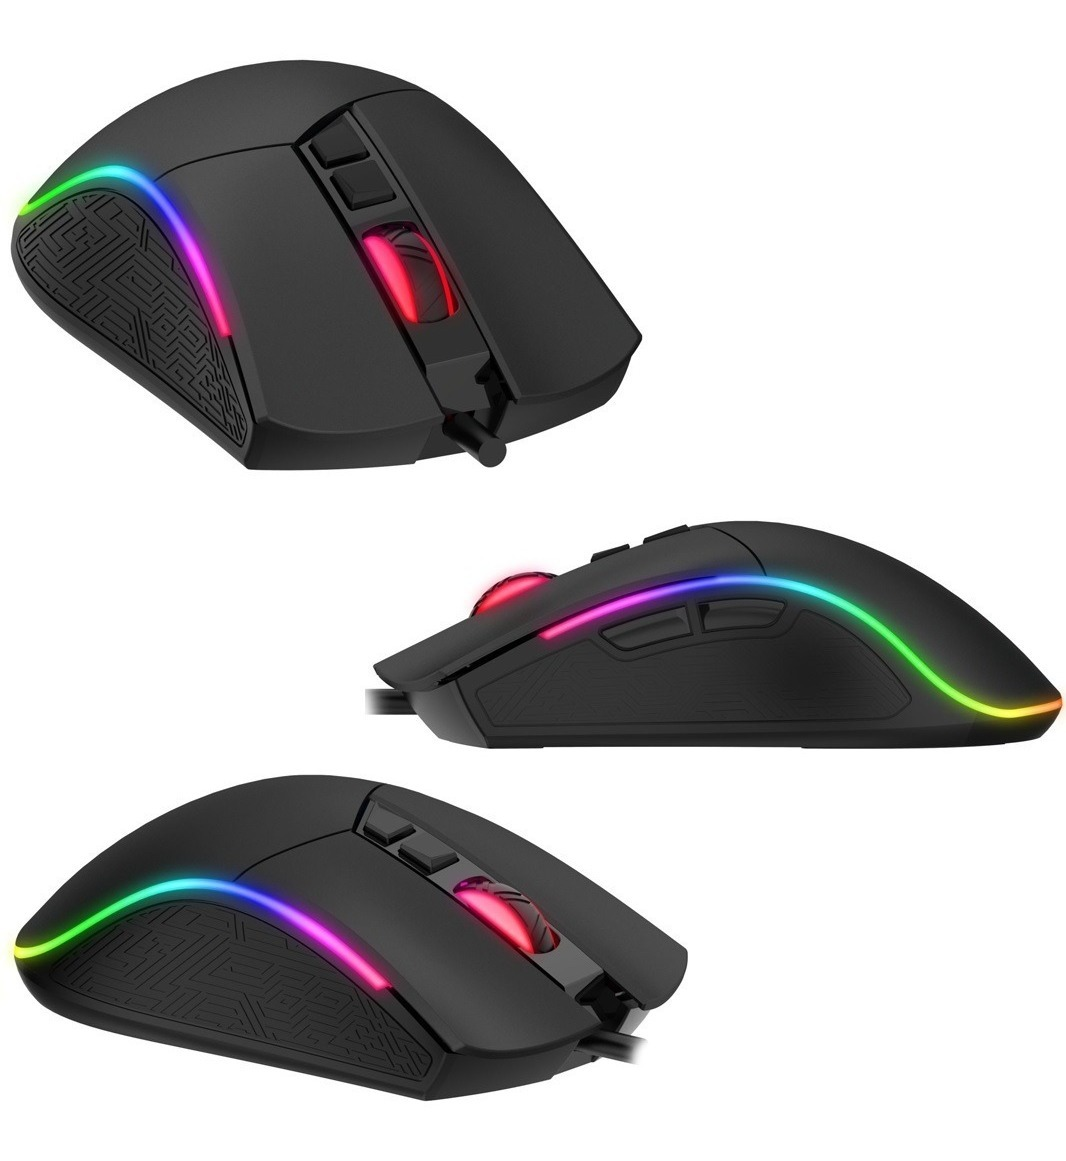 Mouse Gamer Havit Rgb MS1001 Palm Grip 4800 Dpi 7 botões